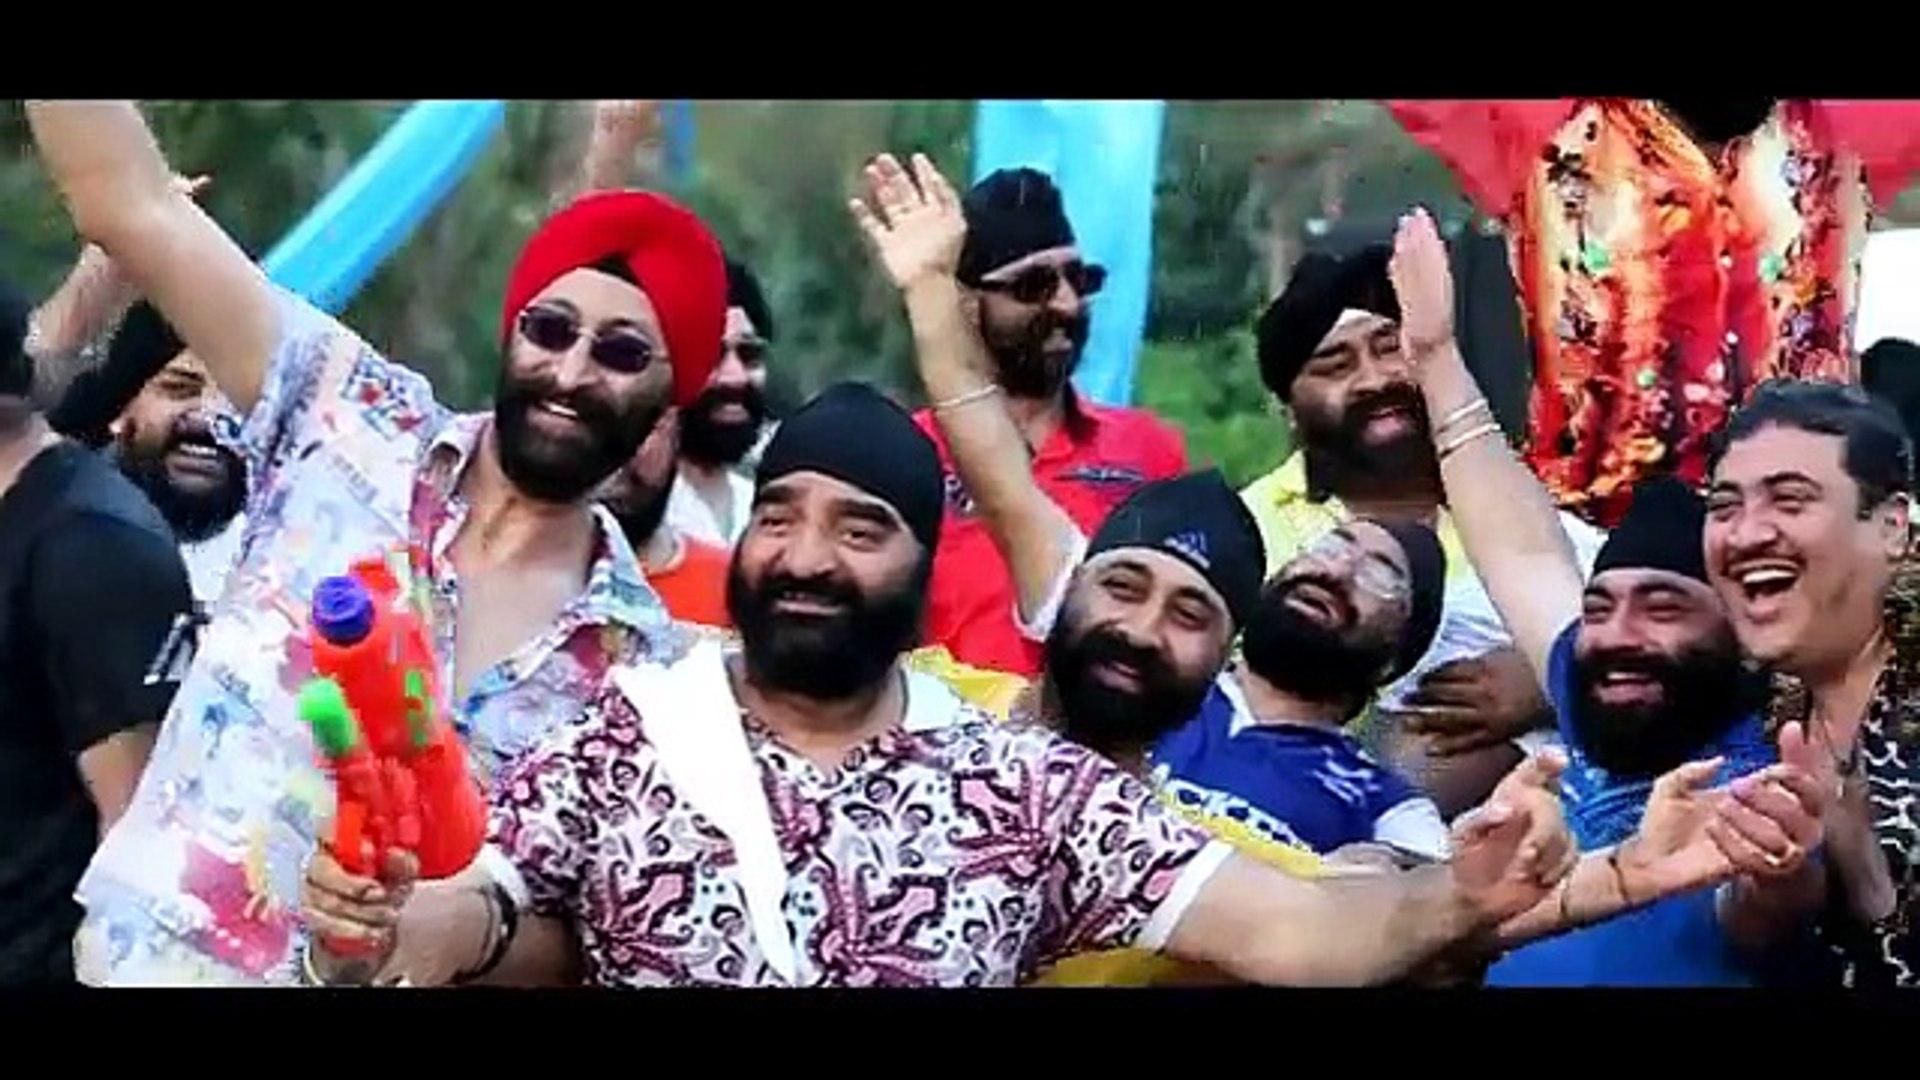 Big Fat Sikh Wedding # Sumeet & Mandeep # 2014 # Dubai U.A.E